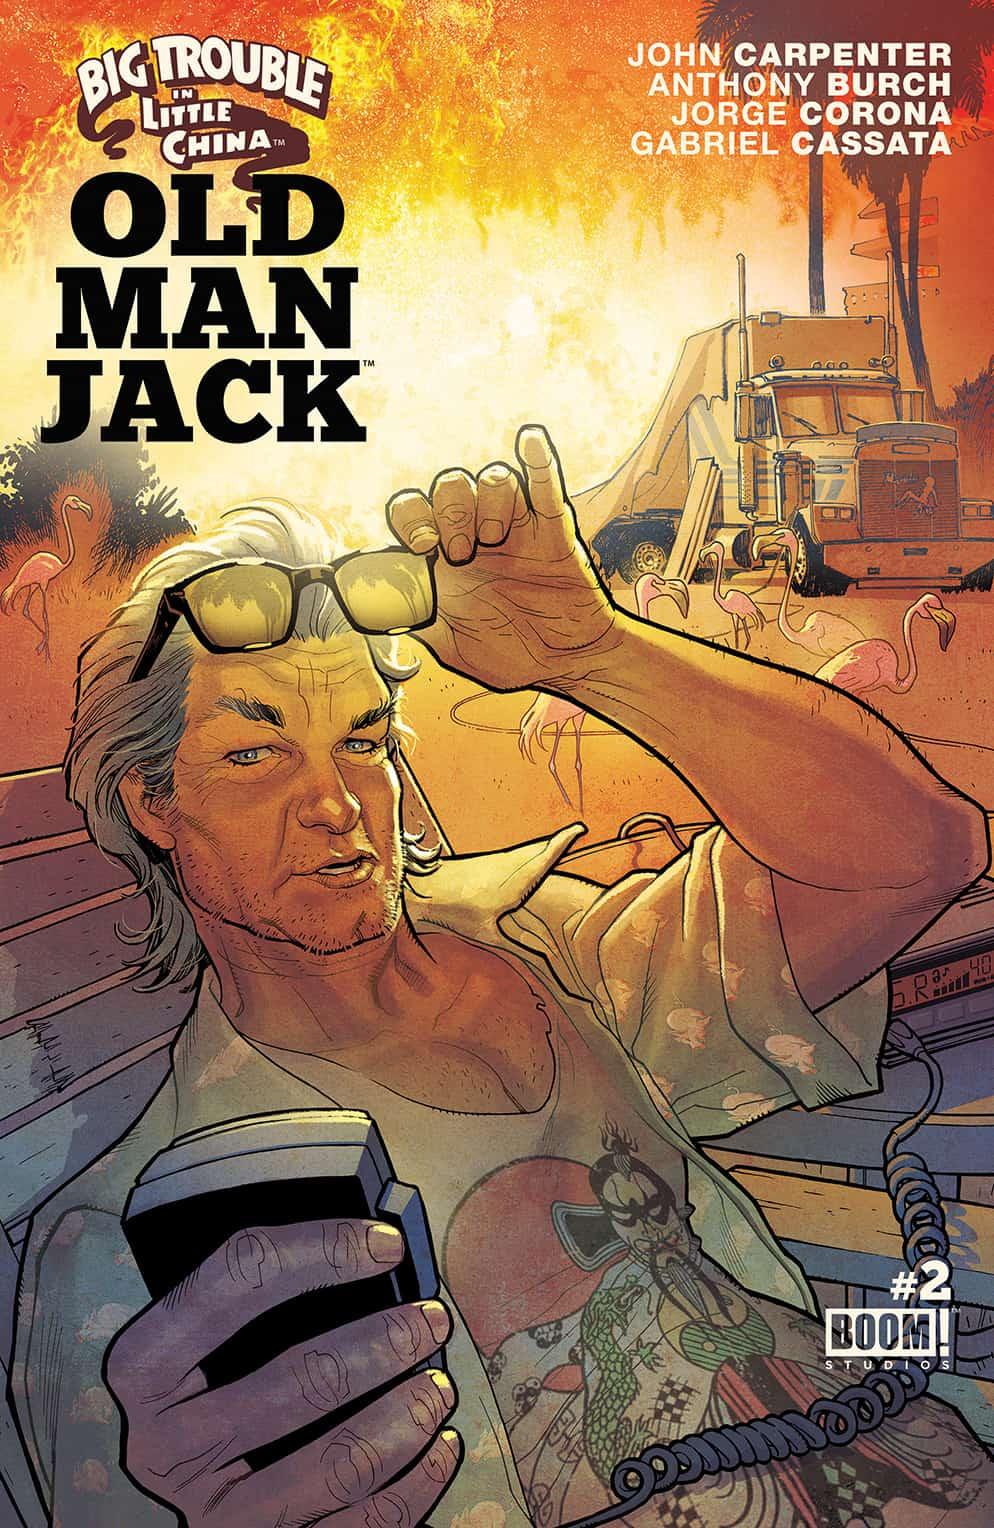 https://shop.boom-studios.com/comics/detail/7998/big-trouble-in-little-china-old-man-jack-2